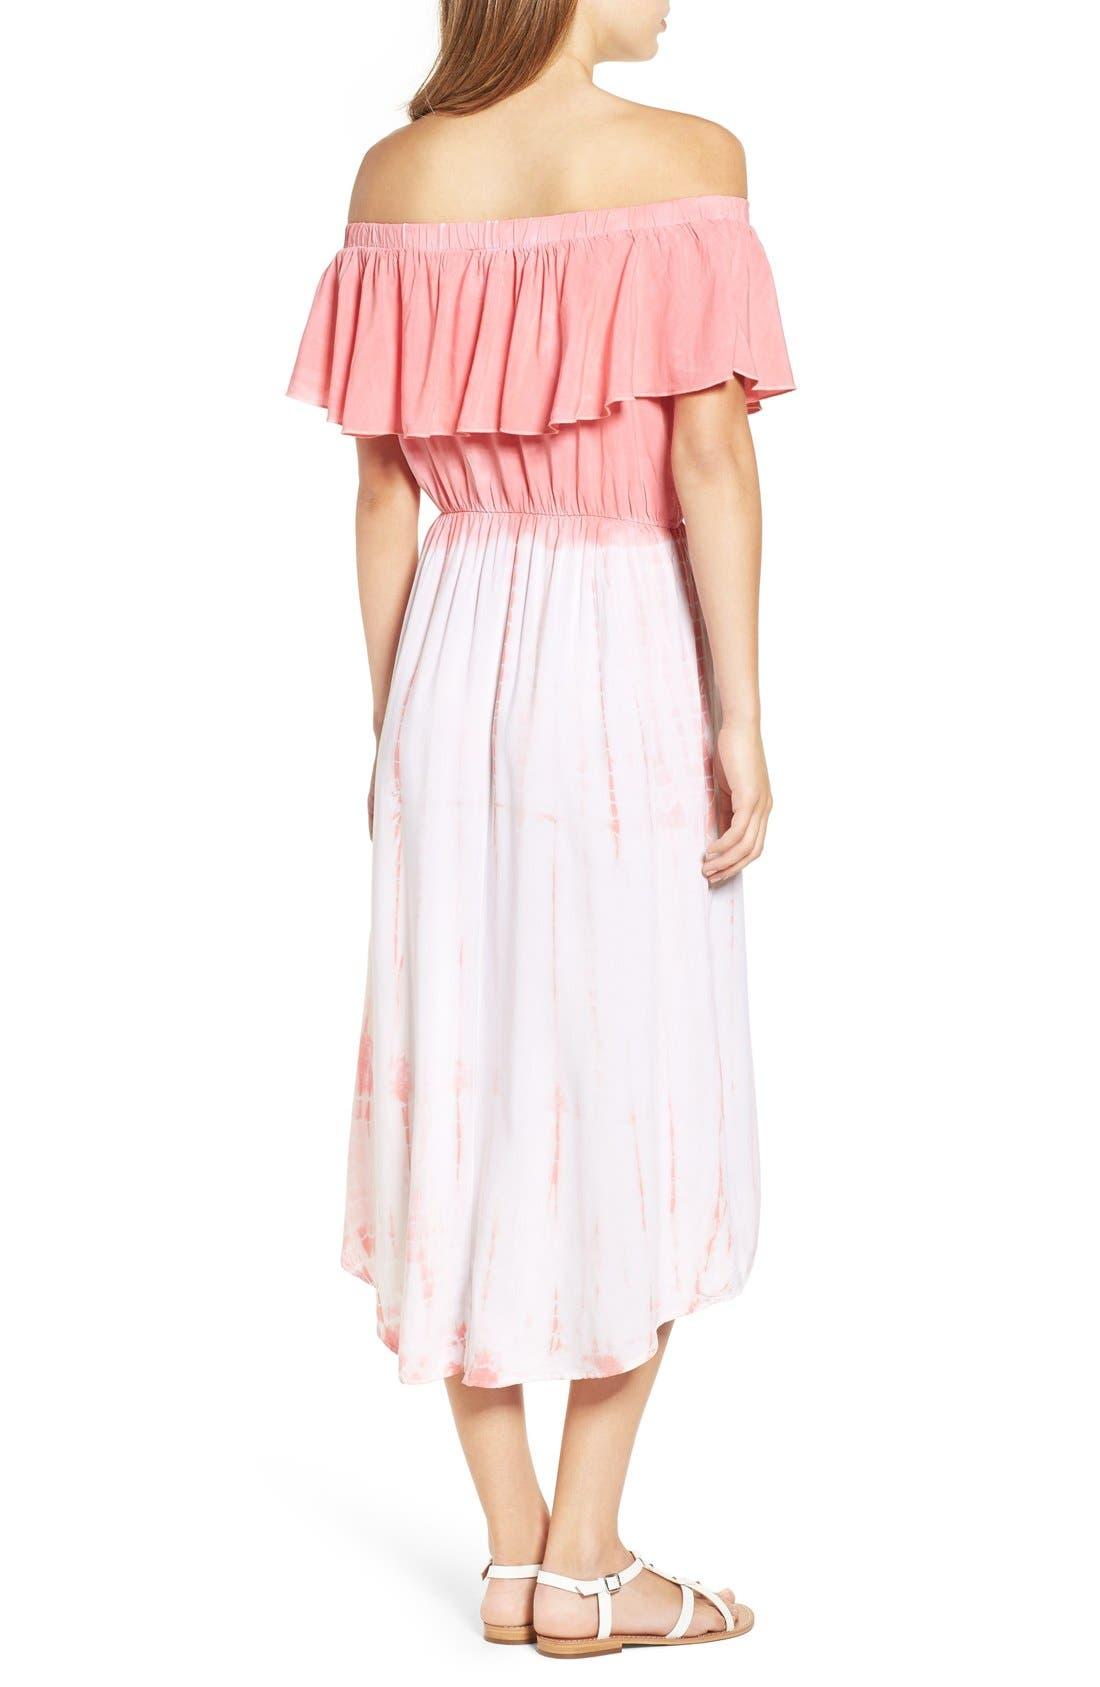 Alternate Image 2  - jella c. Off the Shoulder Tie Dye Midi Dress